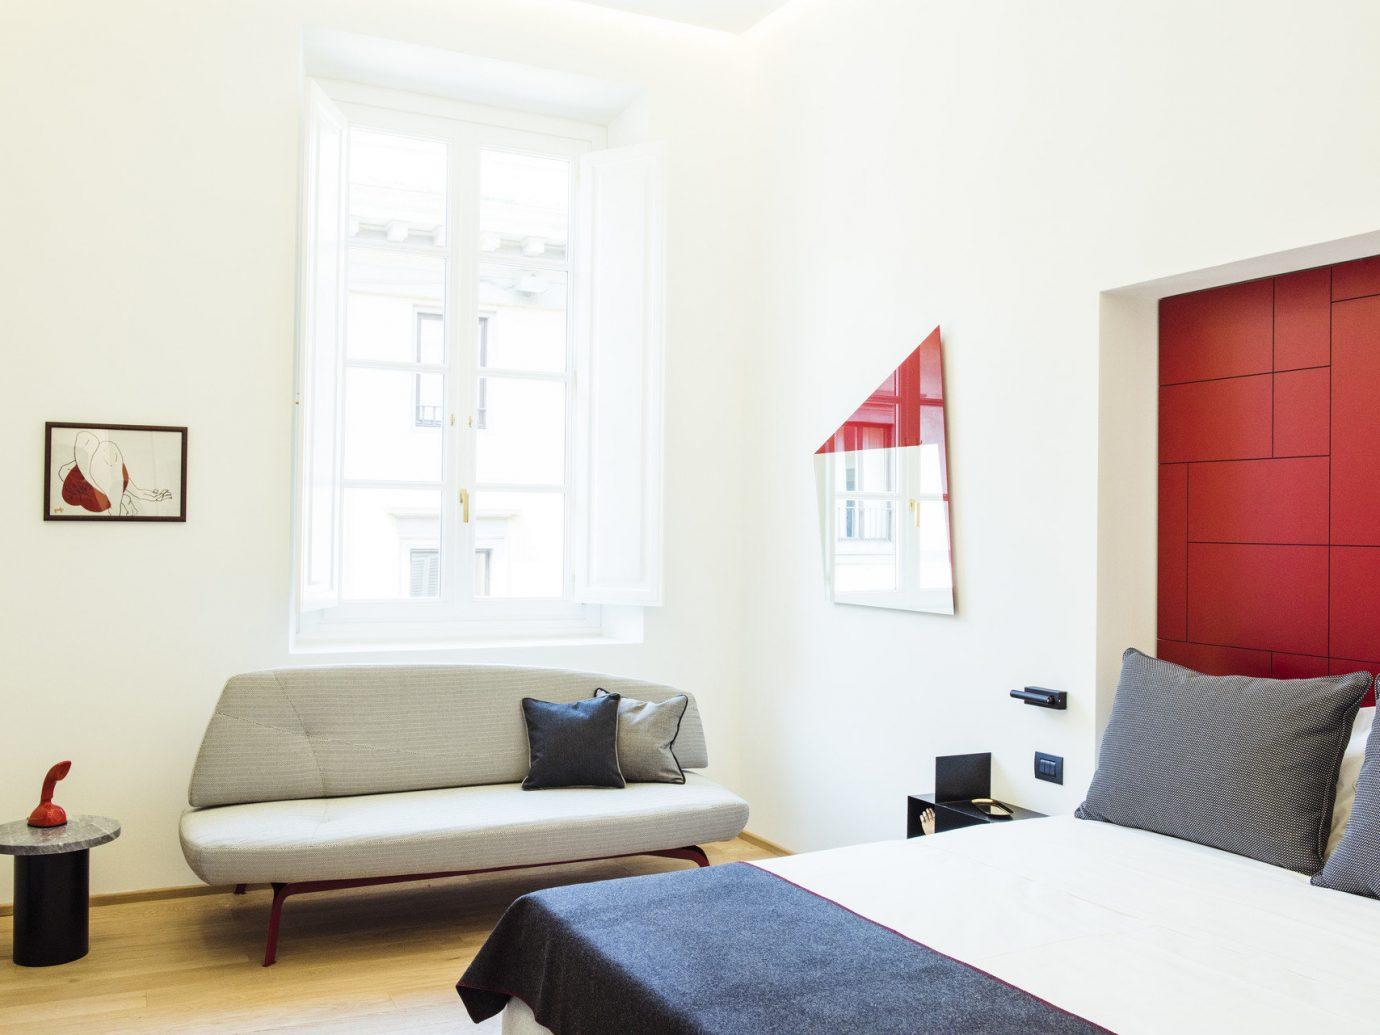 Hotels wall indoor floor room property Bedroom bed interior design home cottage real estate living room Design Suite apartment furniture